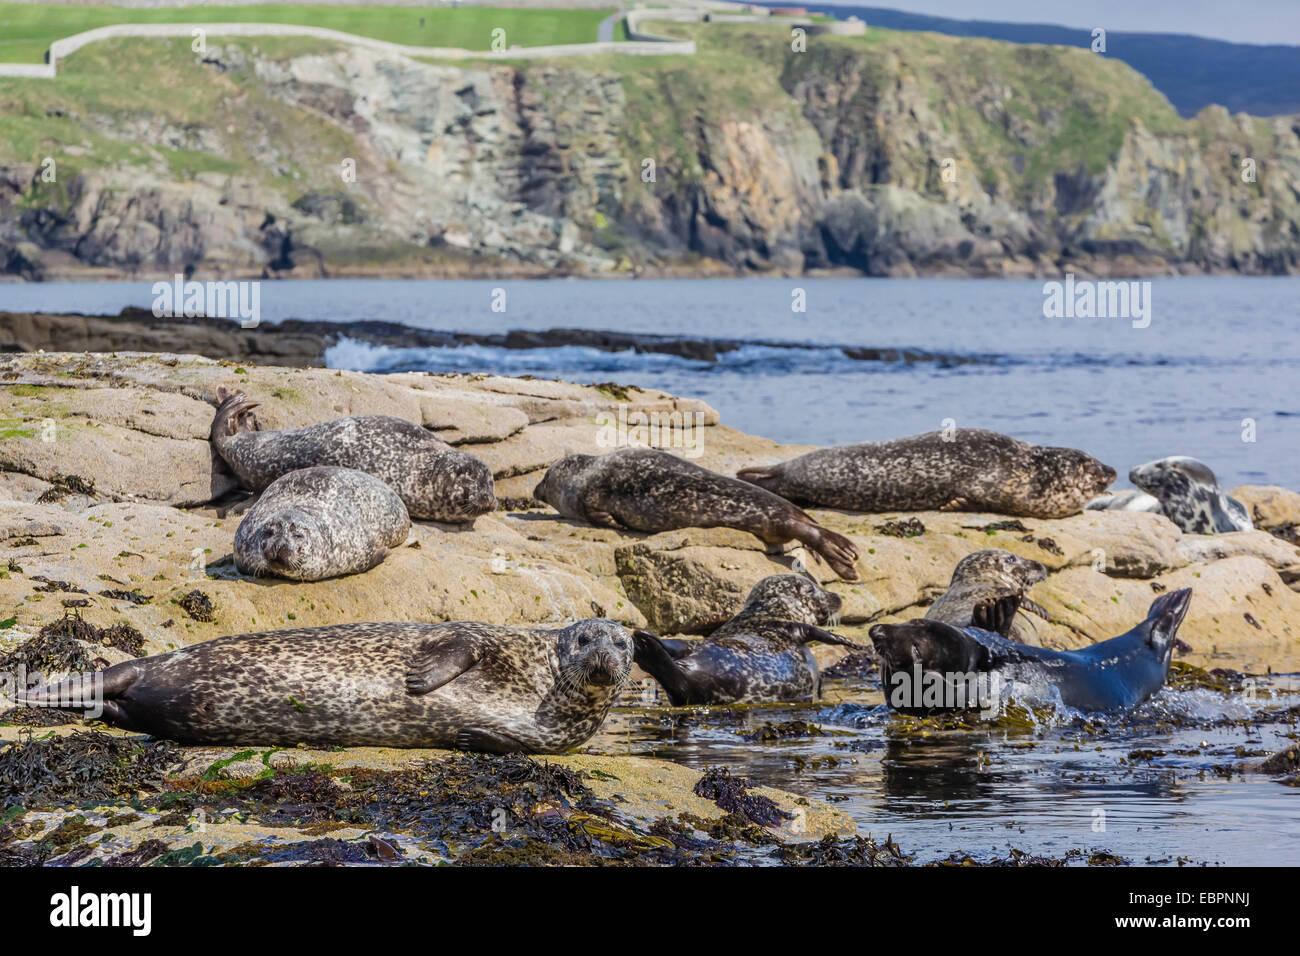 Gray seals (grey seals) (Halichoerus grypus) hauled out on the shoreline on Mainland Island, Shetland Isles, Scotland, Stock Photo